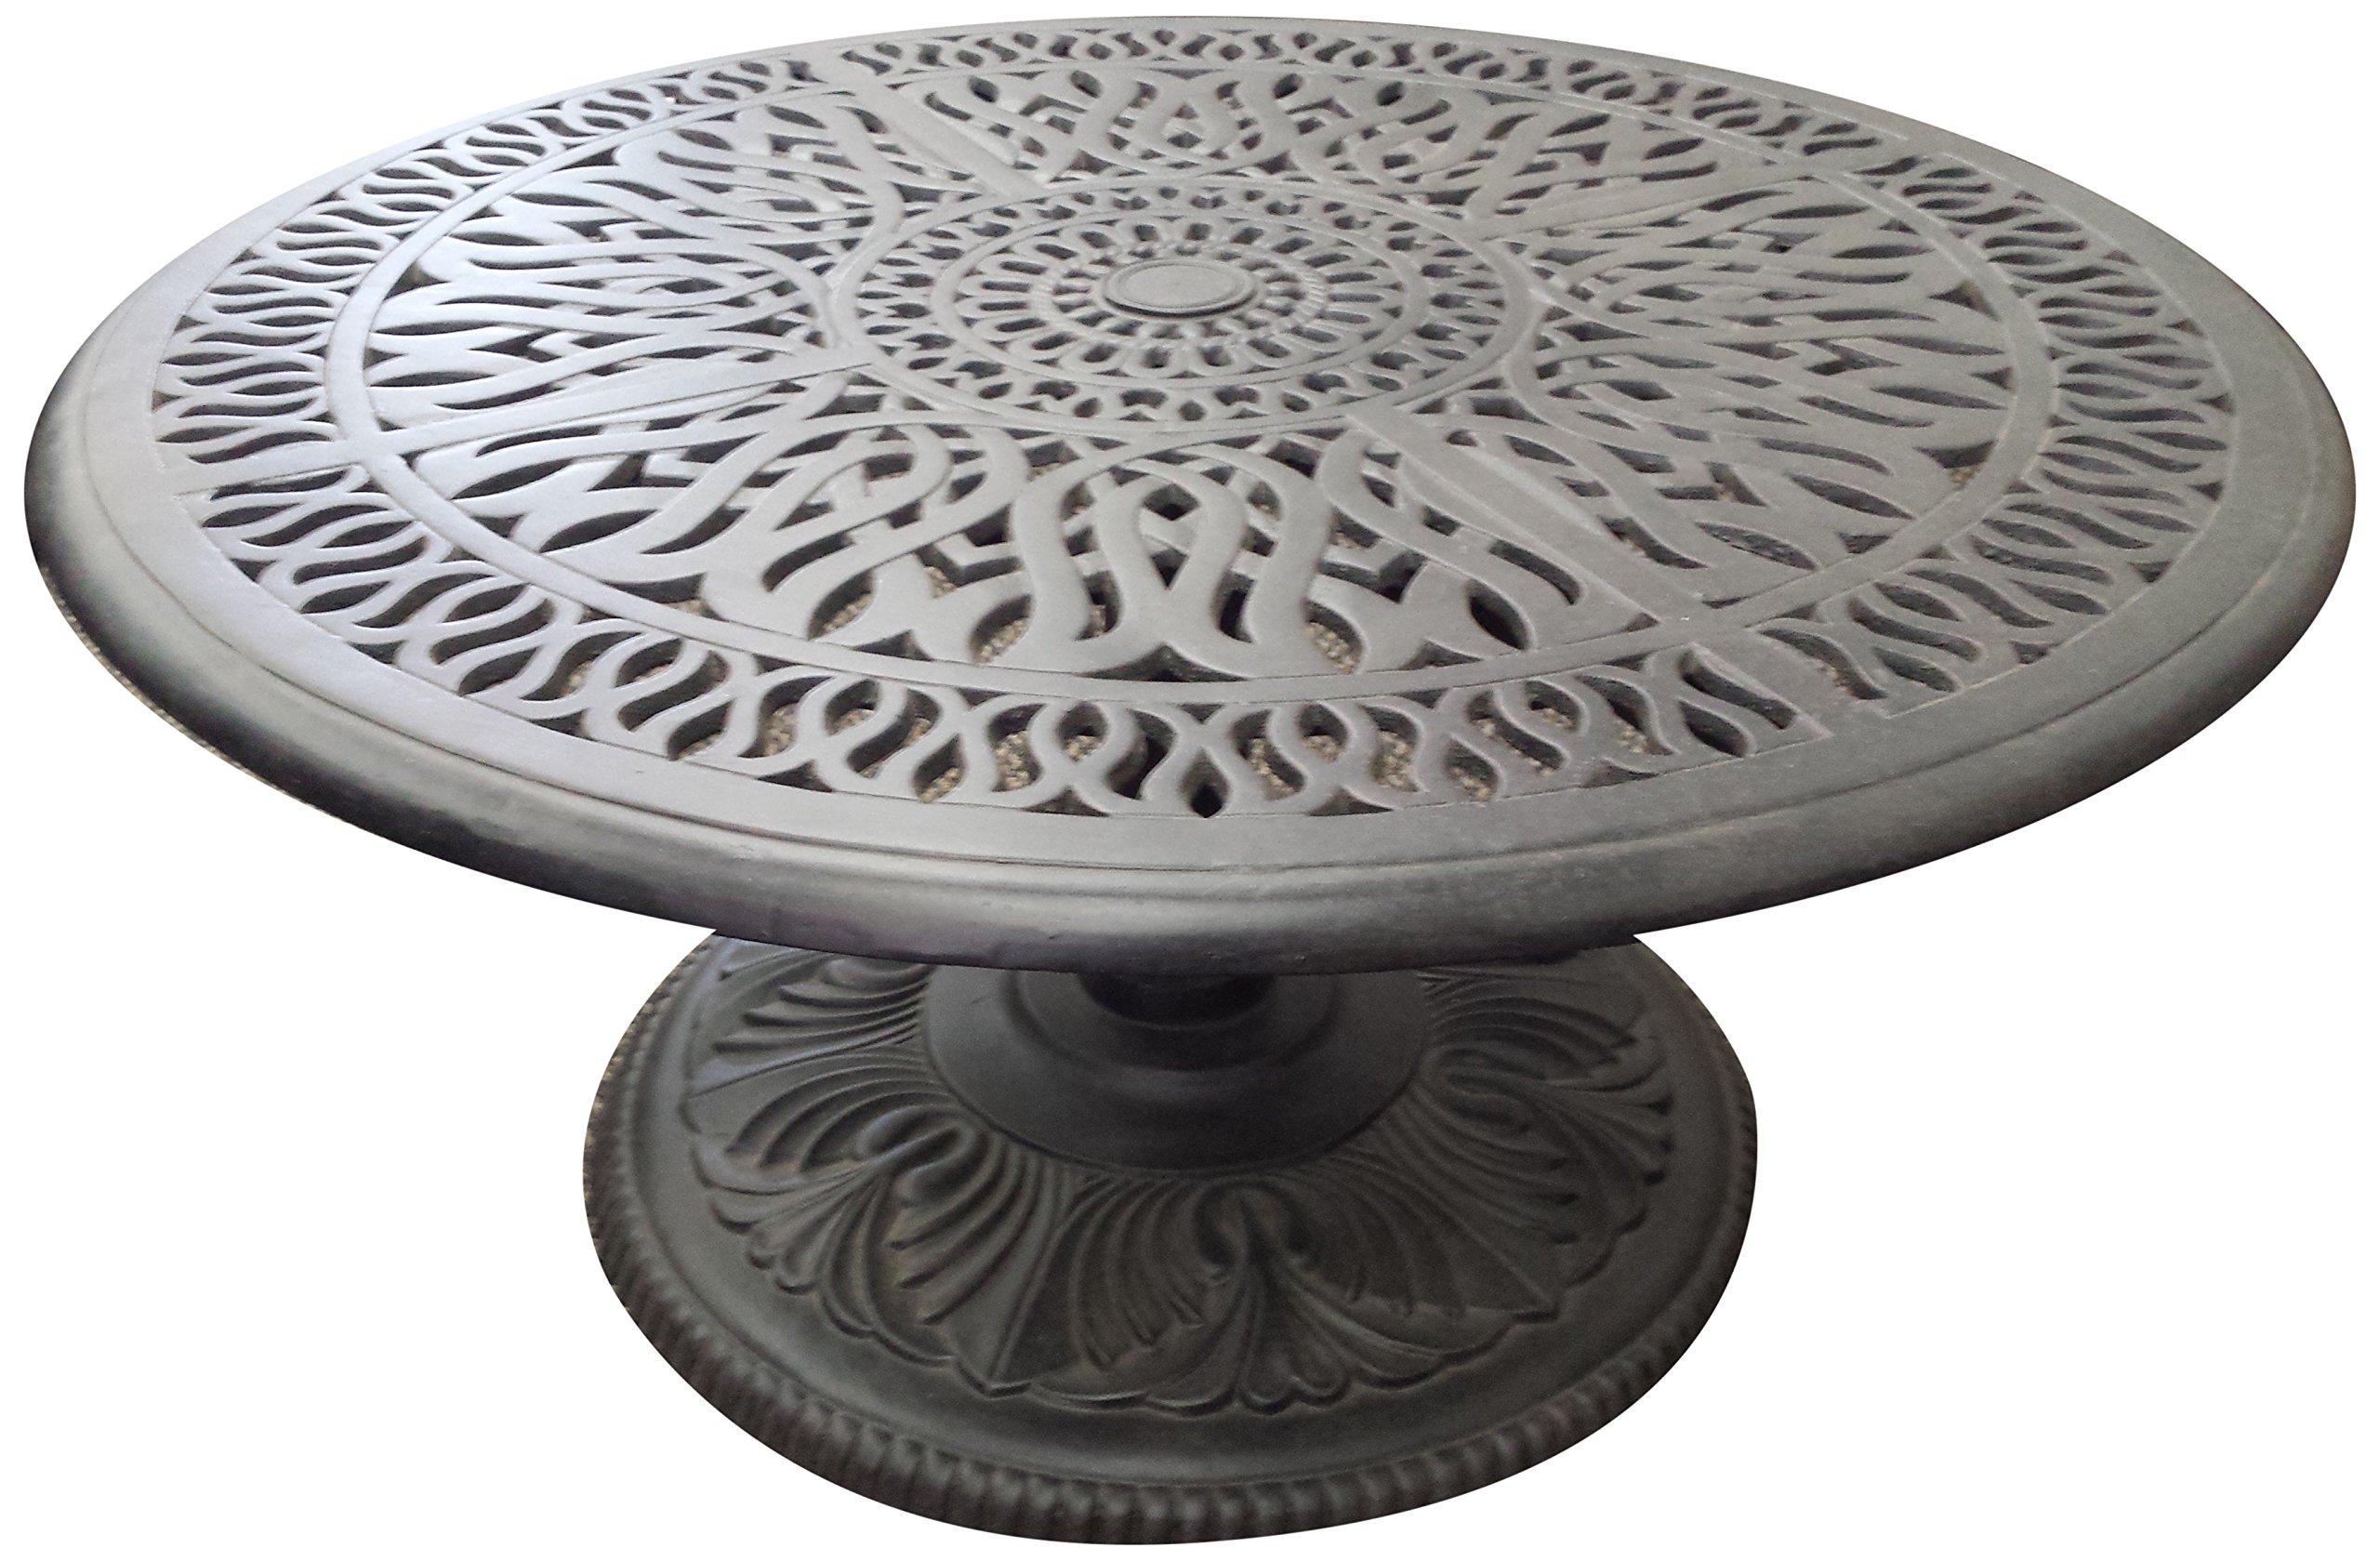 K&B PATIO LD777PE-36'' Elizabeth Pedestal Round Coffee Table, 36'', Antique Bronze by K&B PATIO